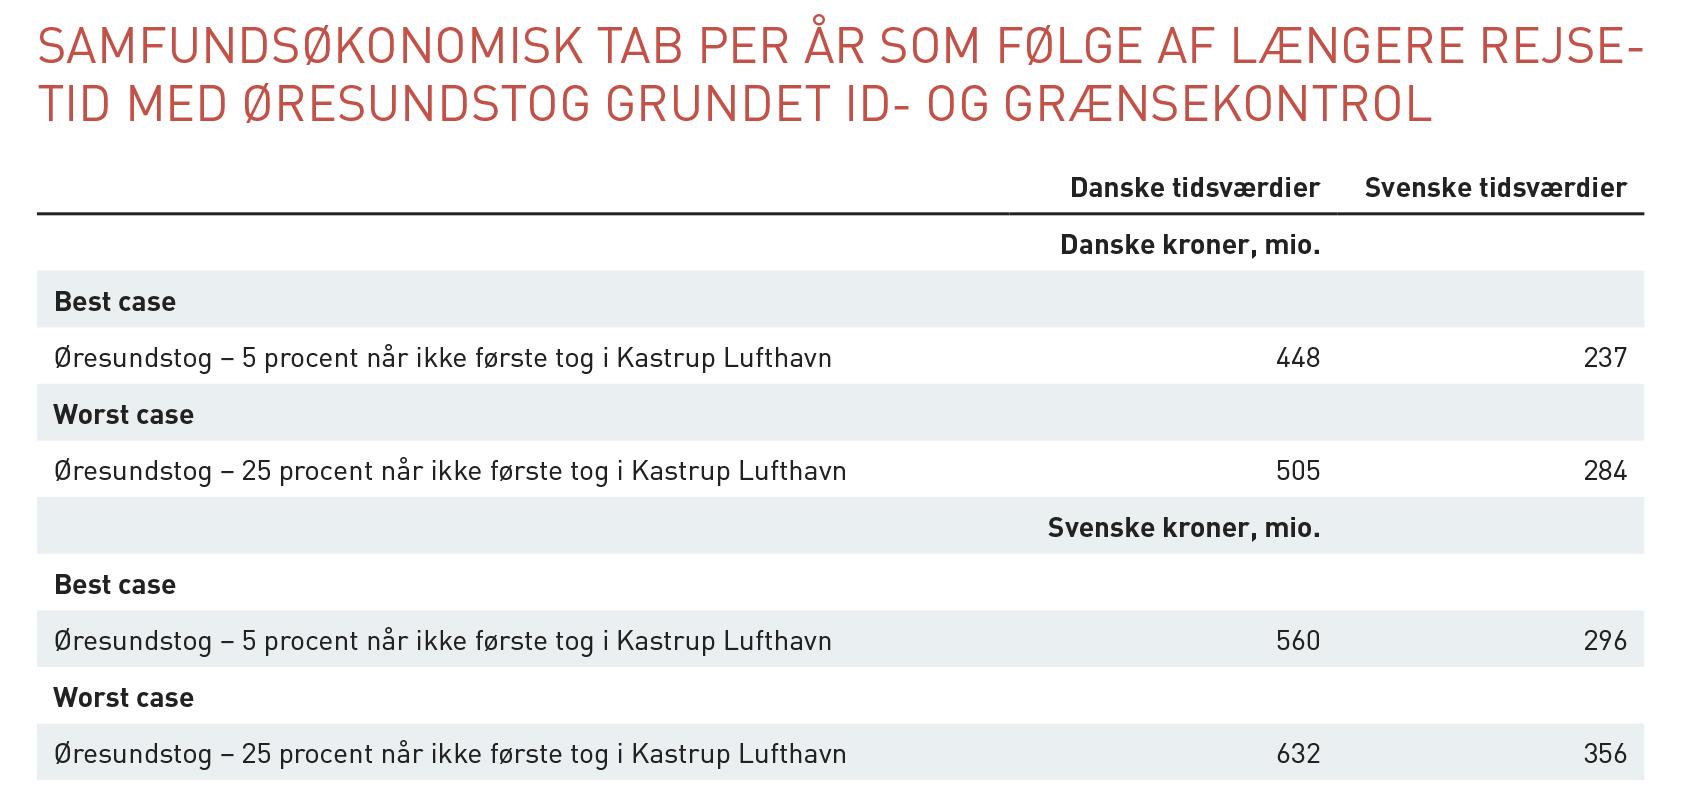 Oresundsanalys_kontroller DK.indd